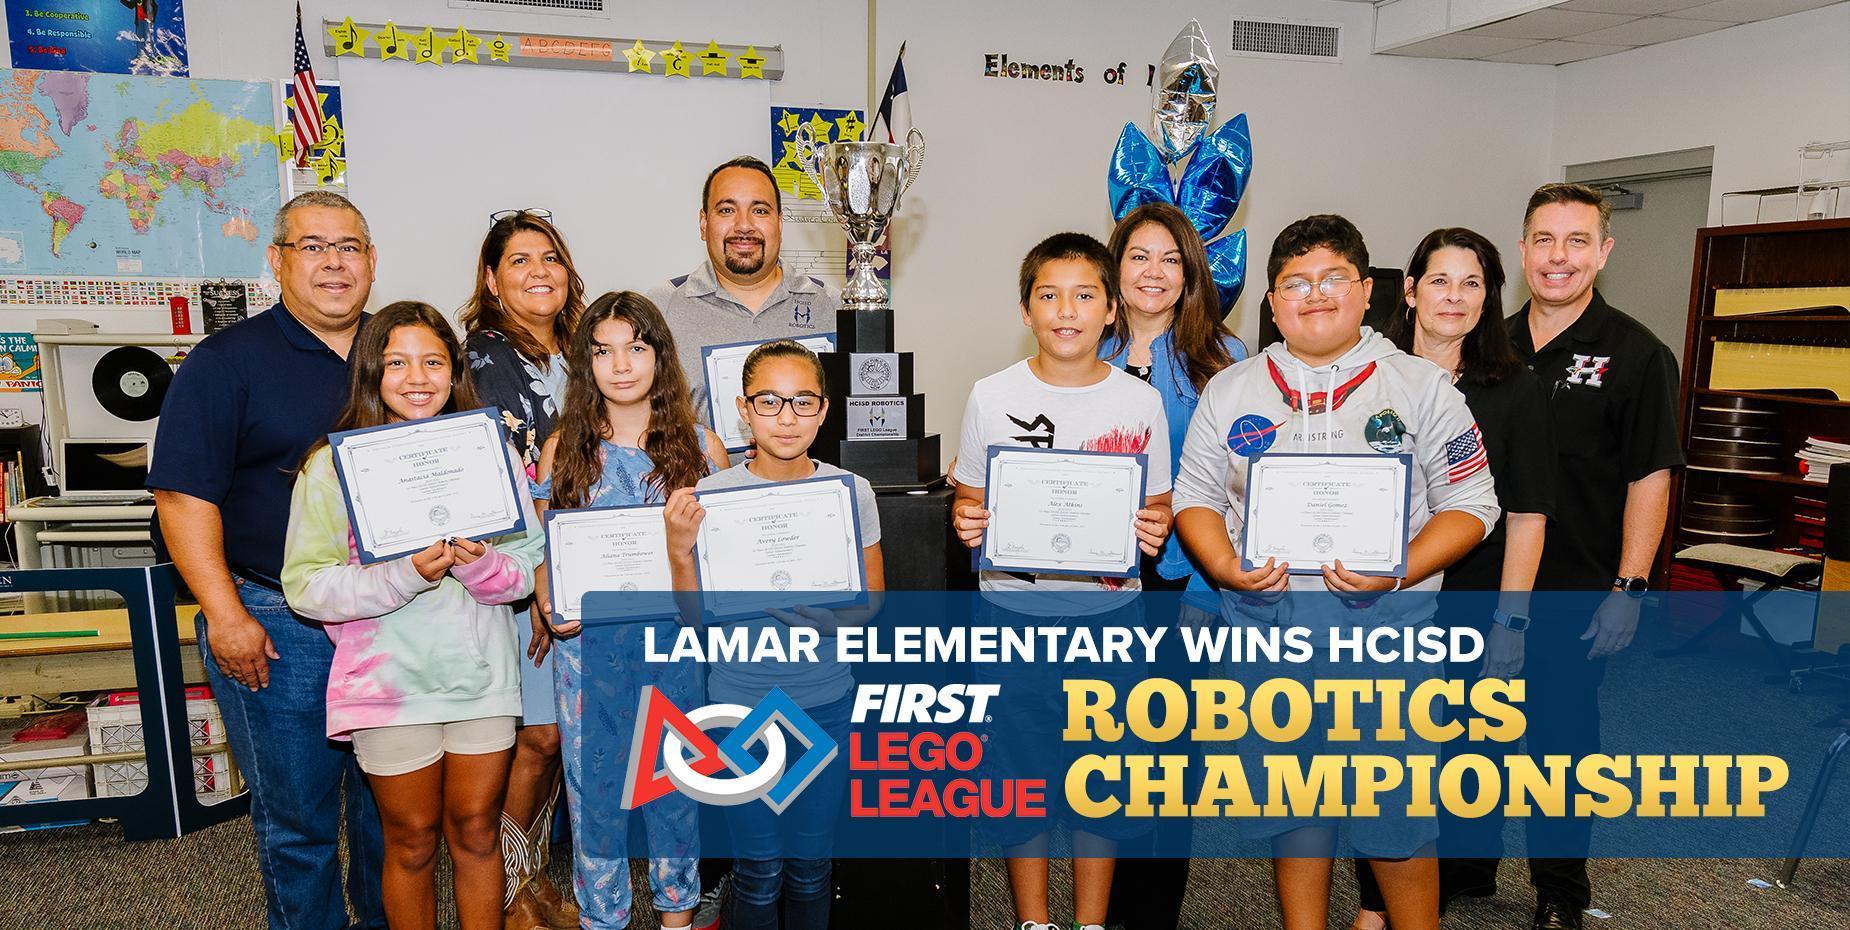 Lamar Elementary wins HCISD FLL Robotics Championship